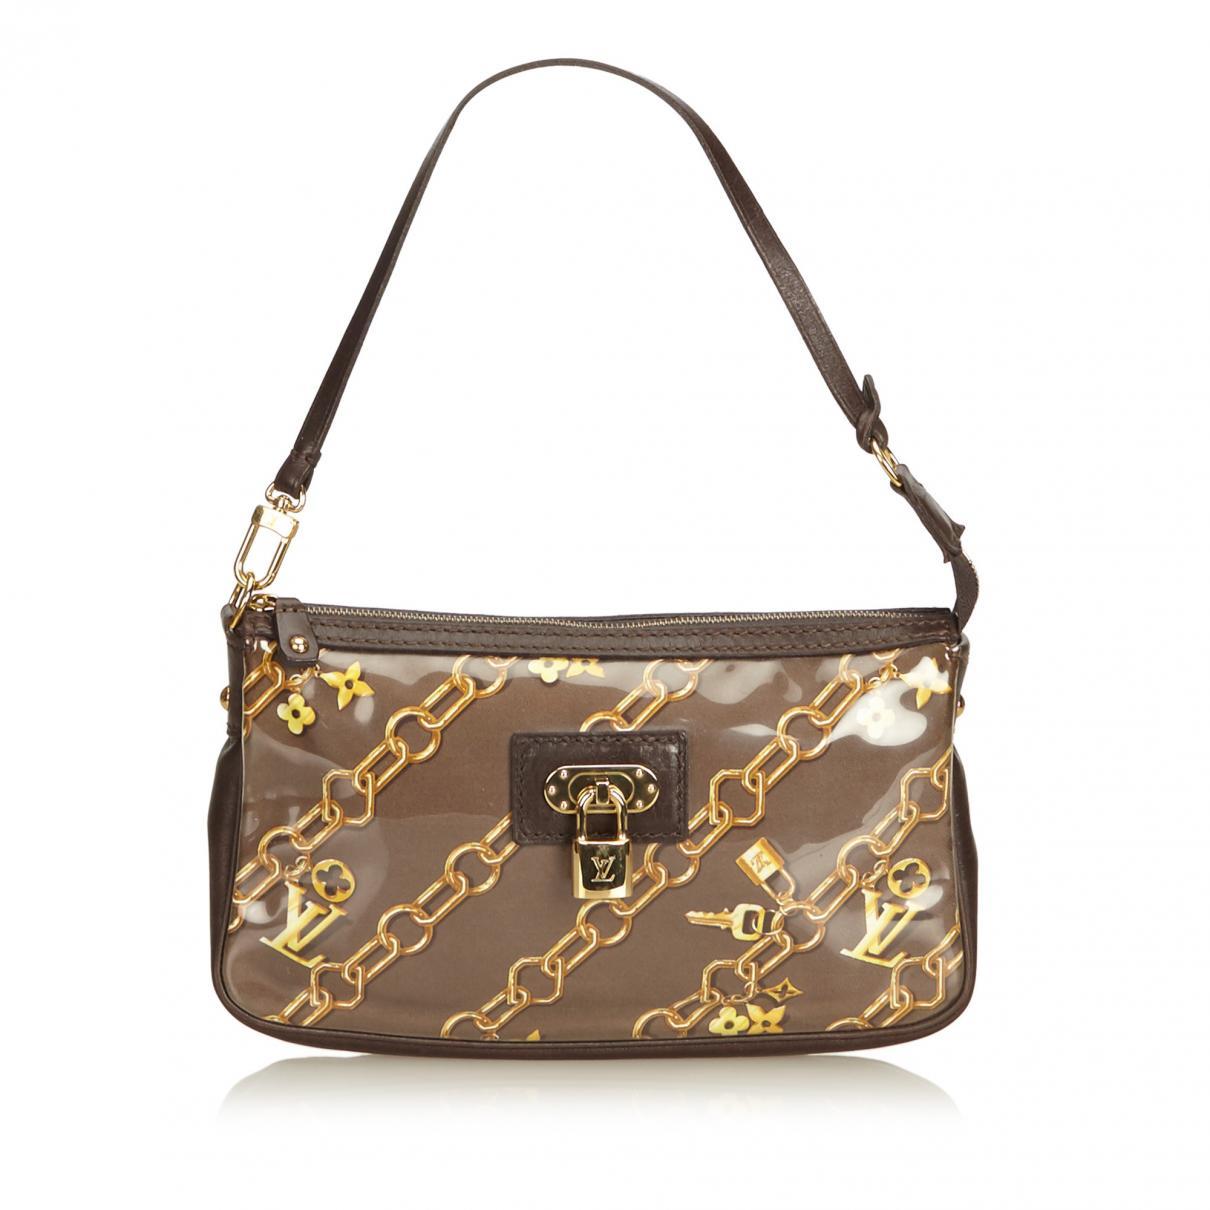 bc7f58ffd6a8 Lyst louis vuitton vintage brown plastic handbag in brown jpg 1210x1210 Louis  vuitton plastic purse